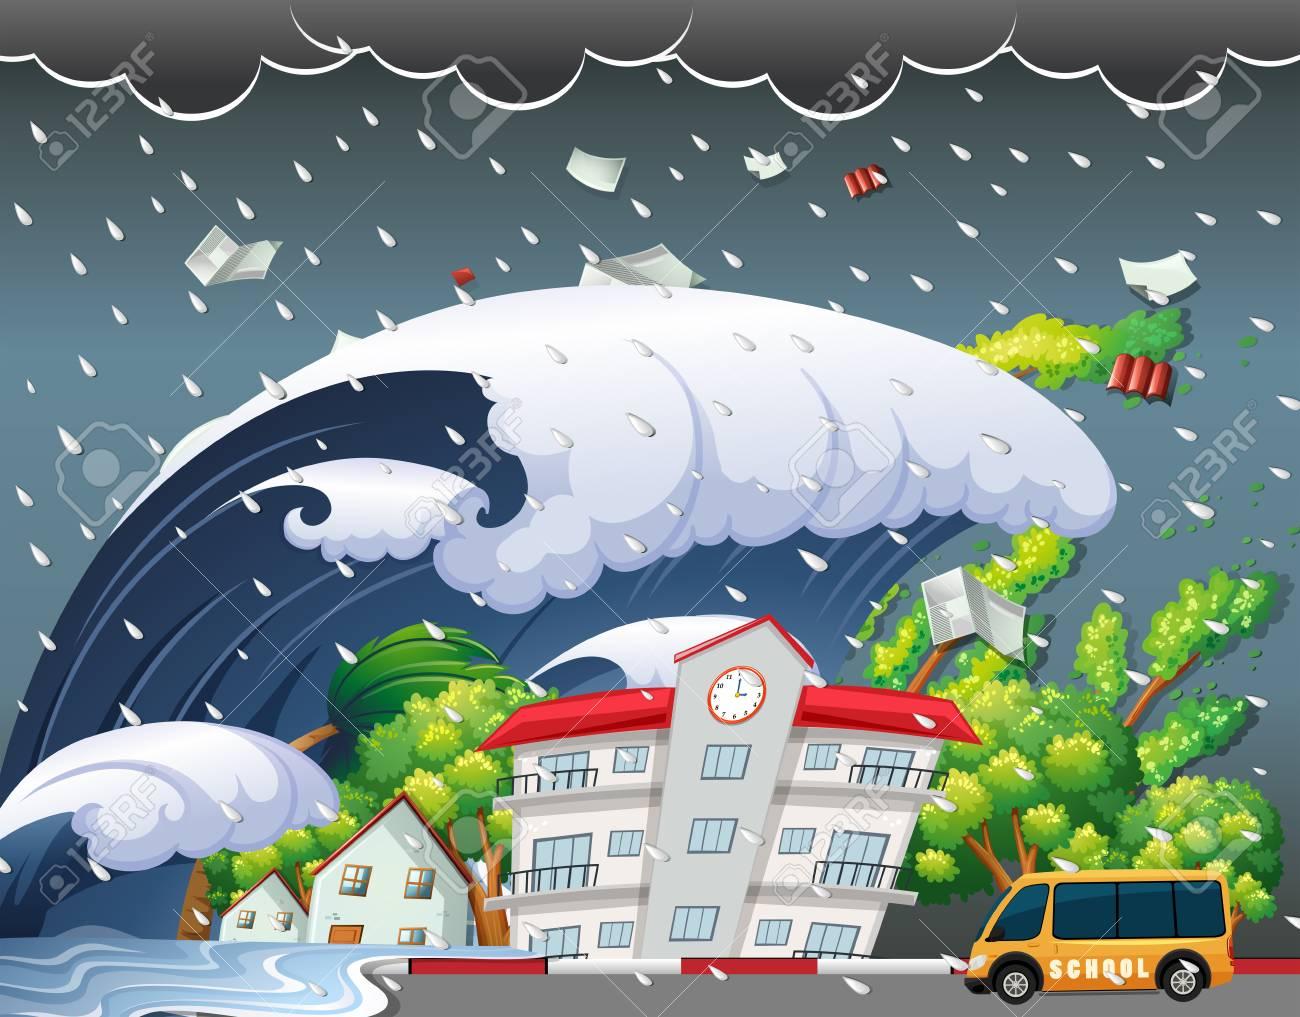 Tsunami hit school building illustration - 110200667